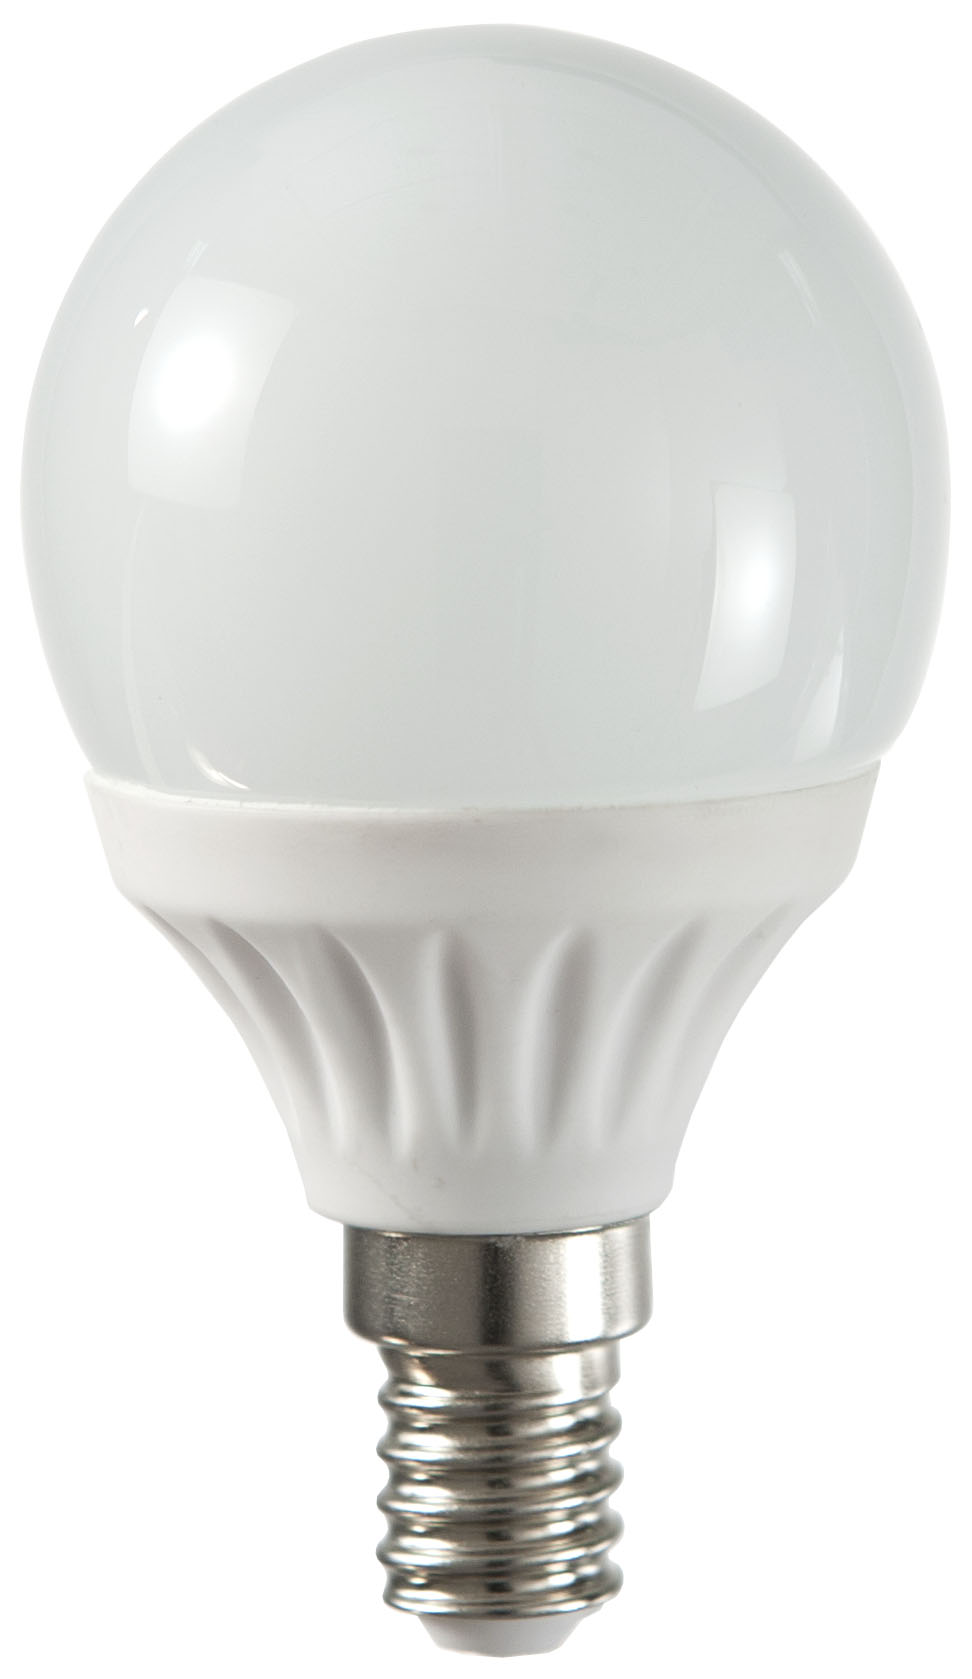 LED Leuchtmittel E14 6 Watt 500 Lumen